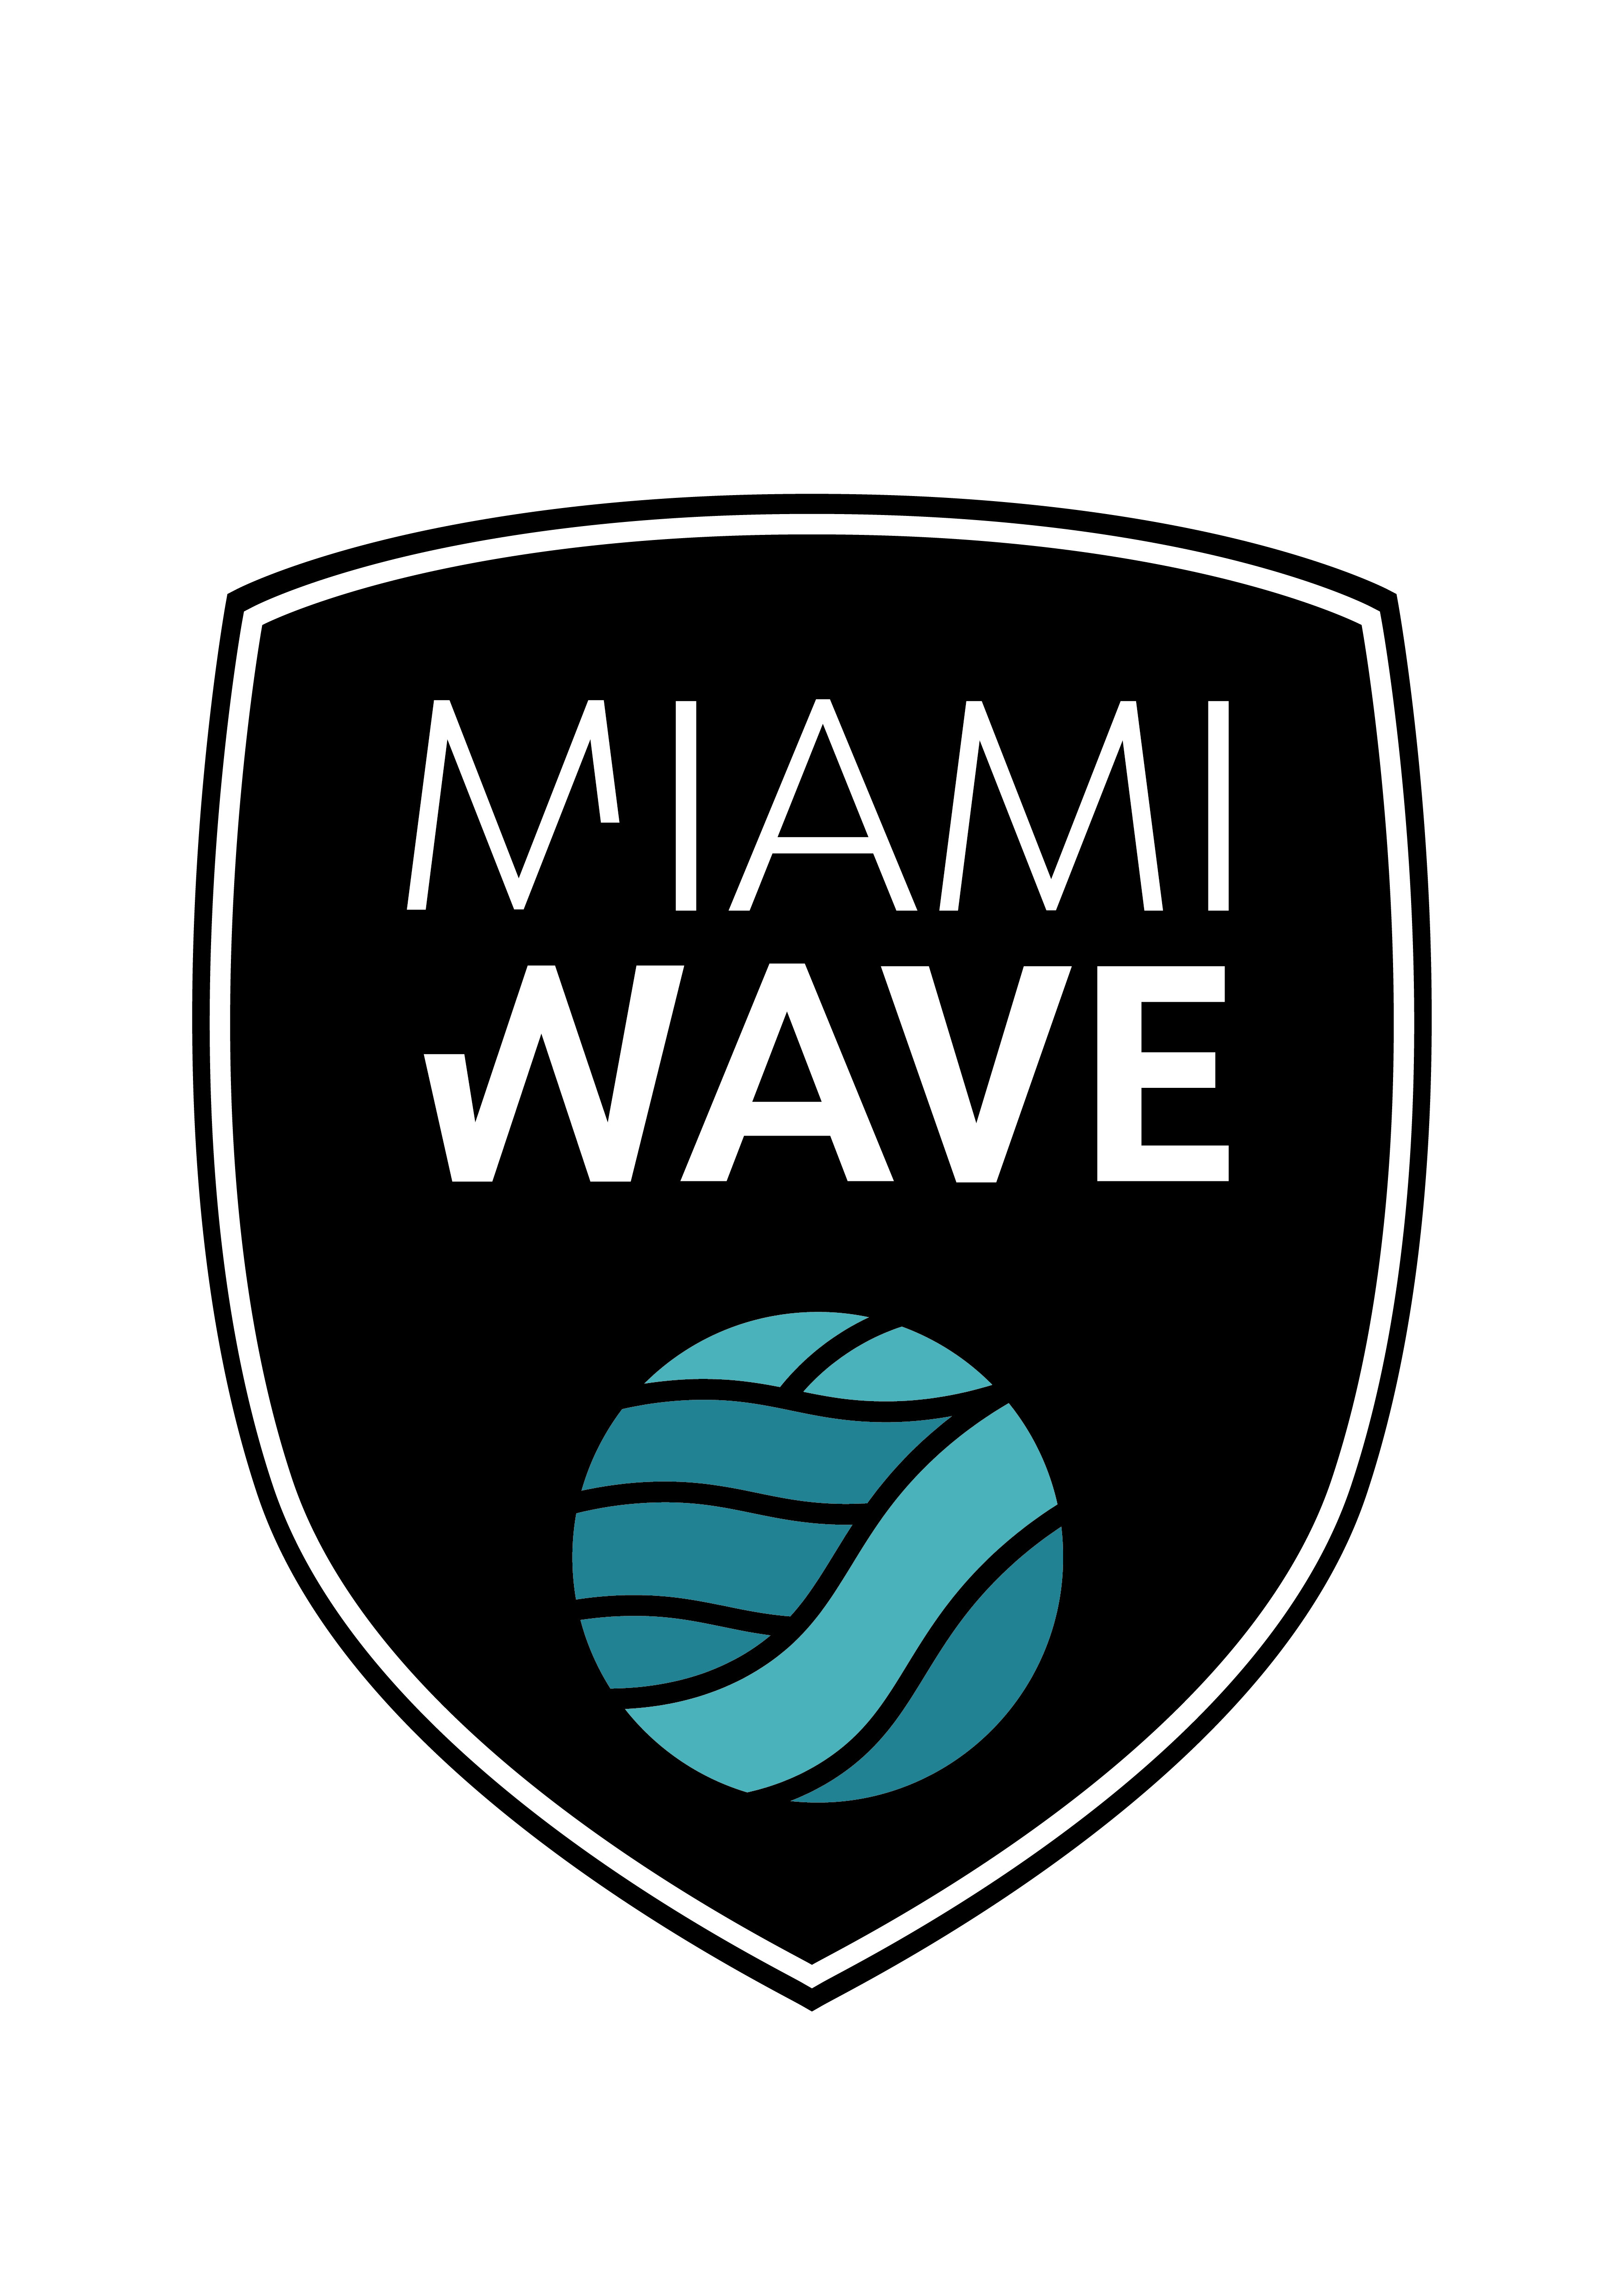 Miami Wave Volleyball Club Announces Their Partnership With Via Emilia 9 Miami Beach And Via Emilia 9 Garden Midto In 2020 Volleyball Clubs Team Coaching Top League